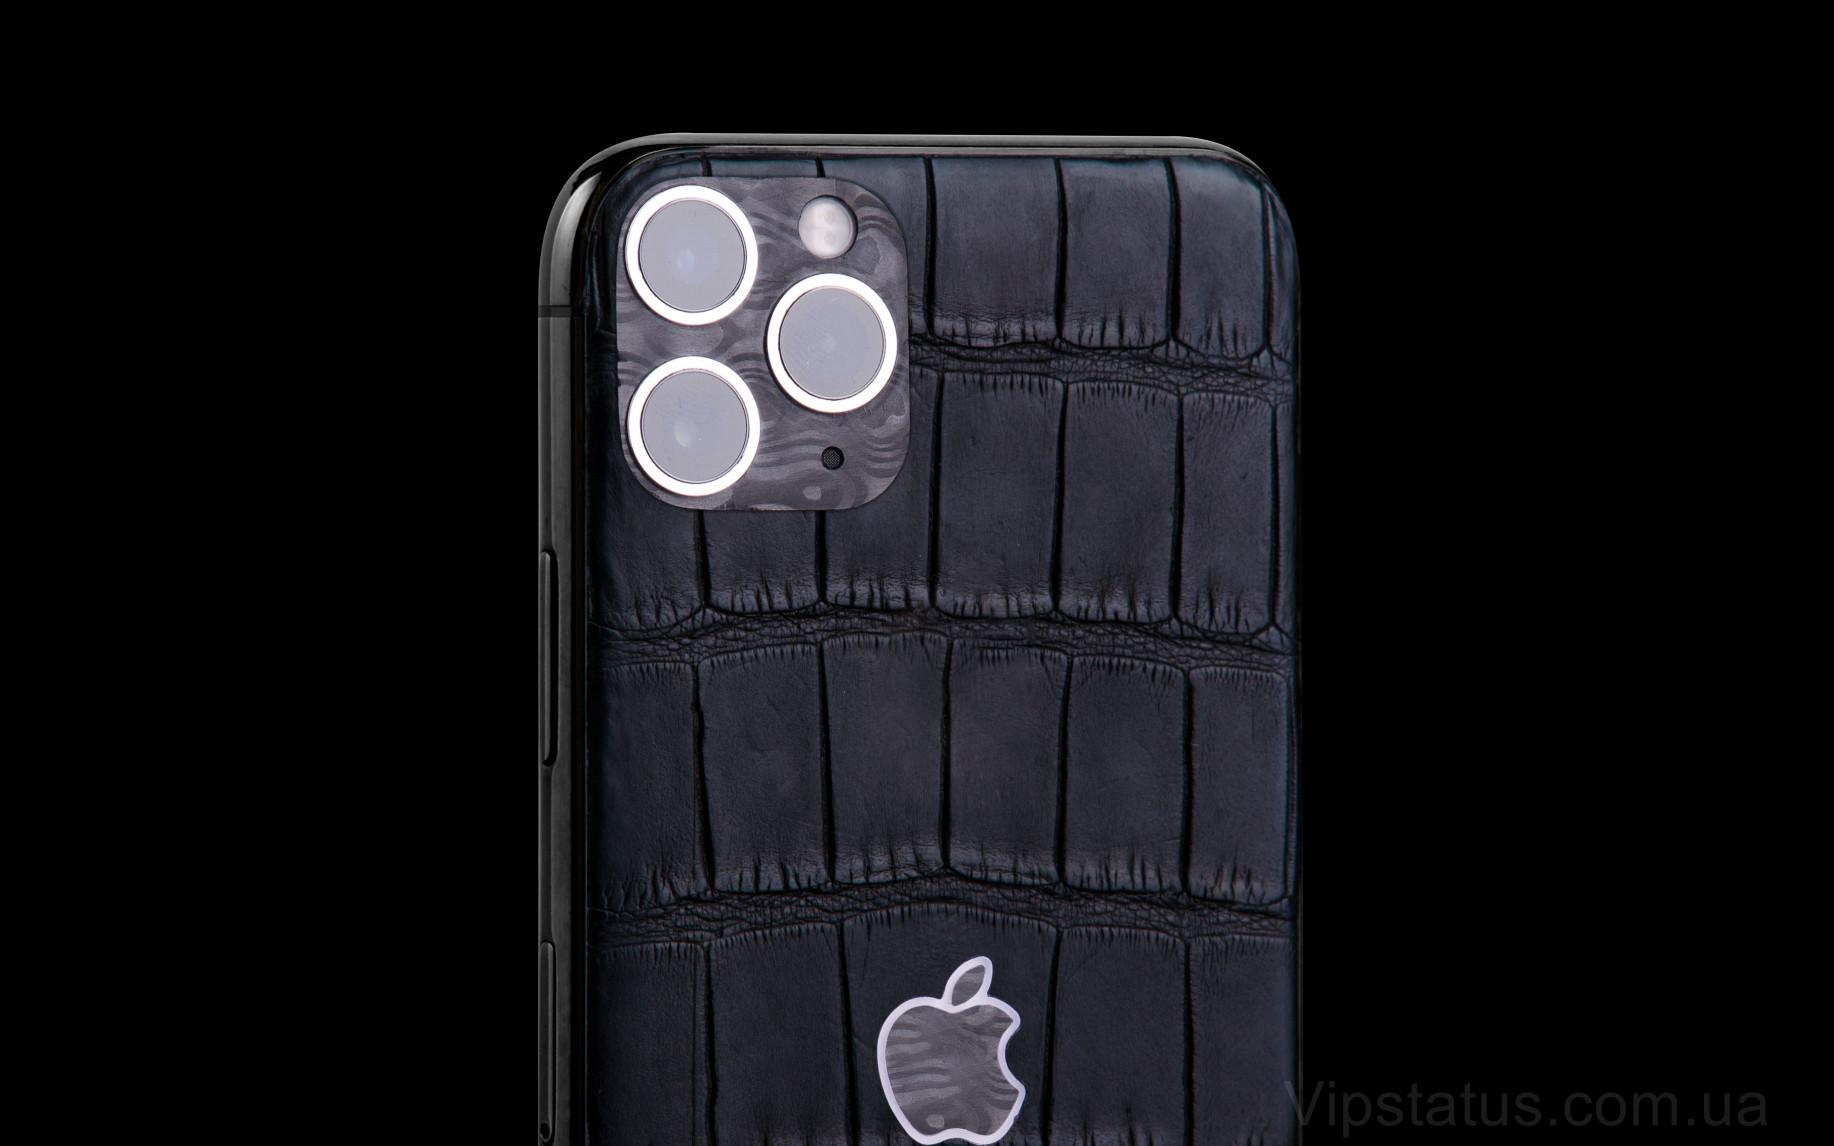 Elite Black Lord Carbon IPHONE 12 PRO MAX 512 GB Black Lord Carbon IPHONE 12 PRO MAX 512 GB image 4